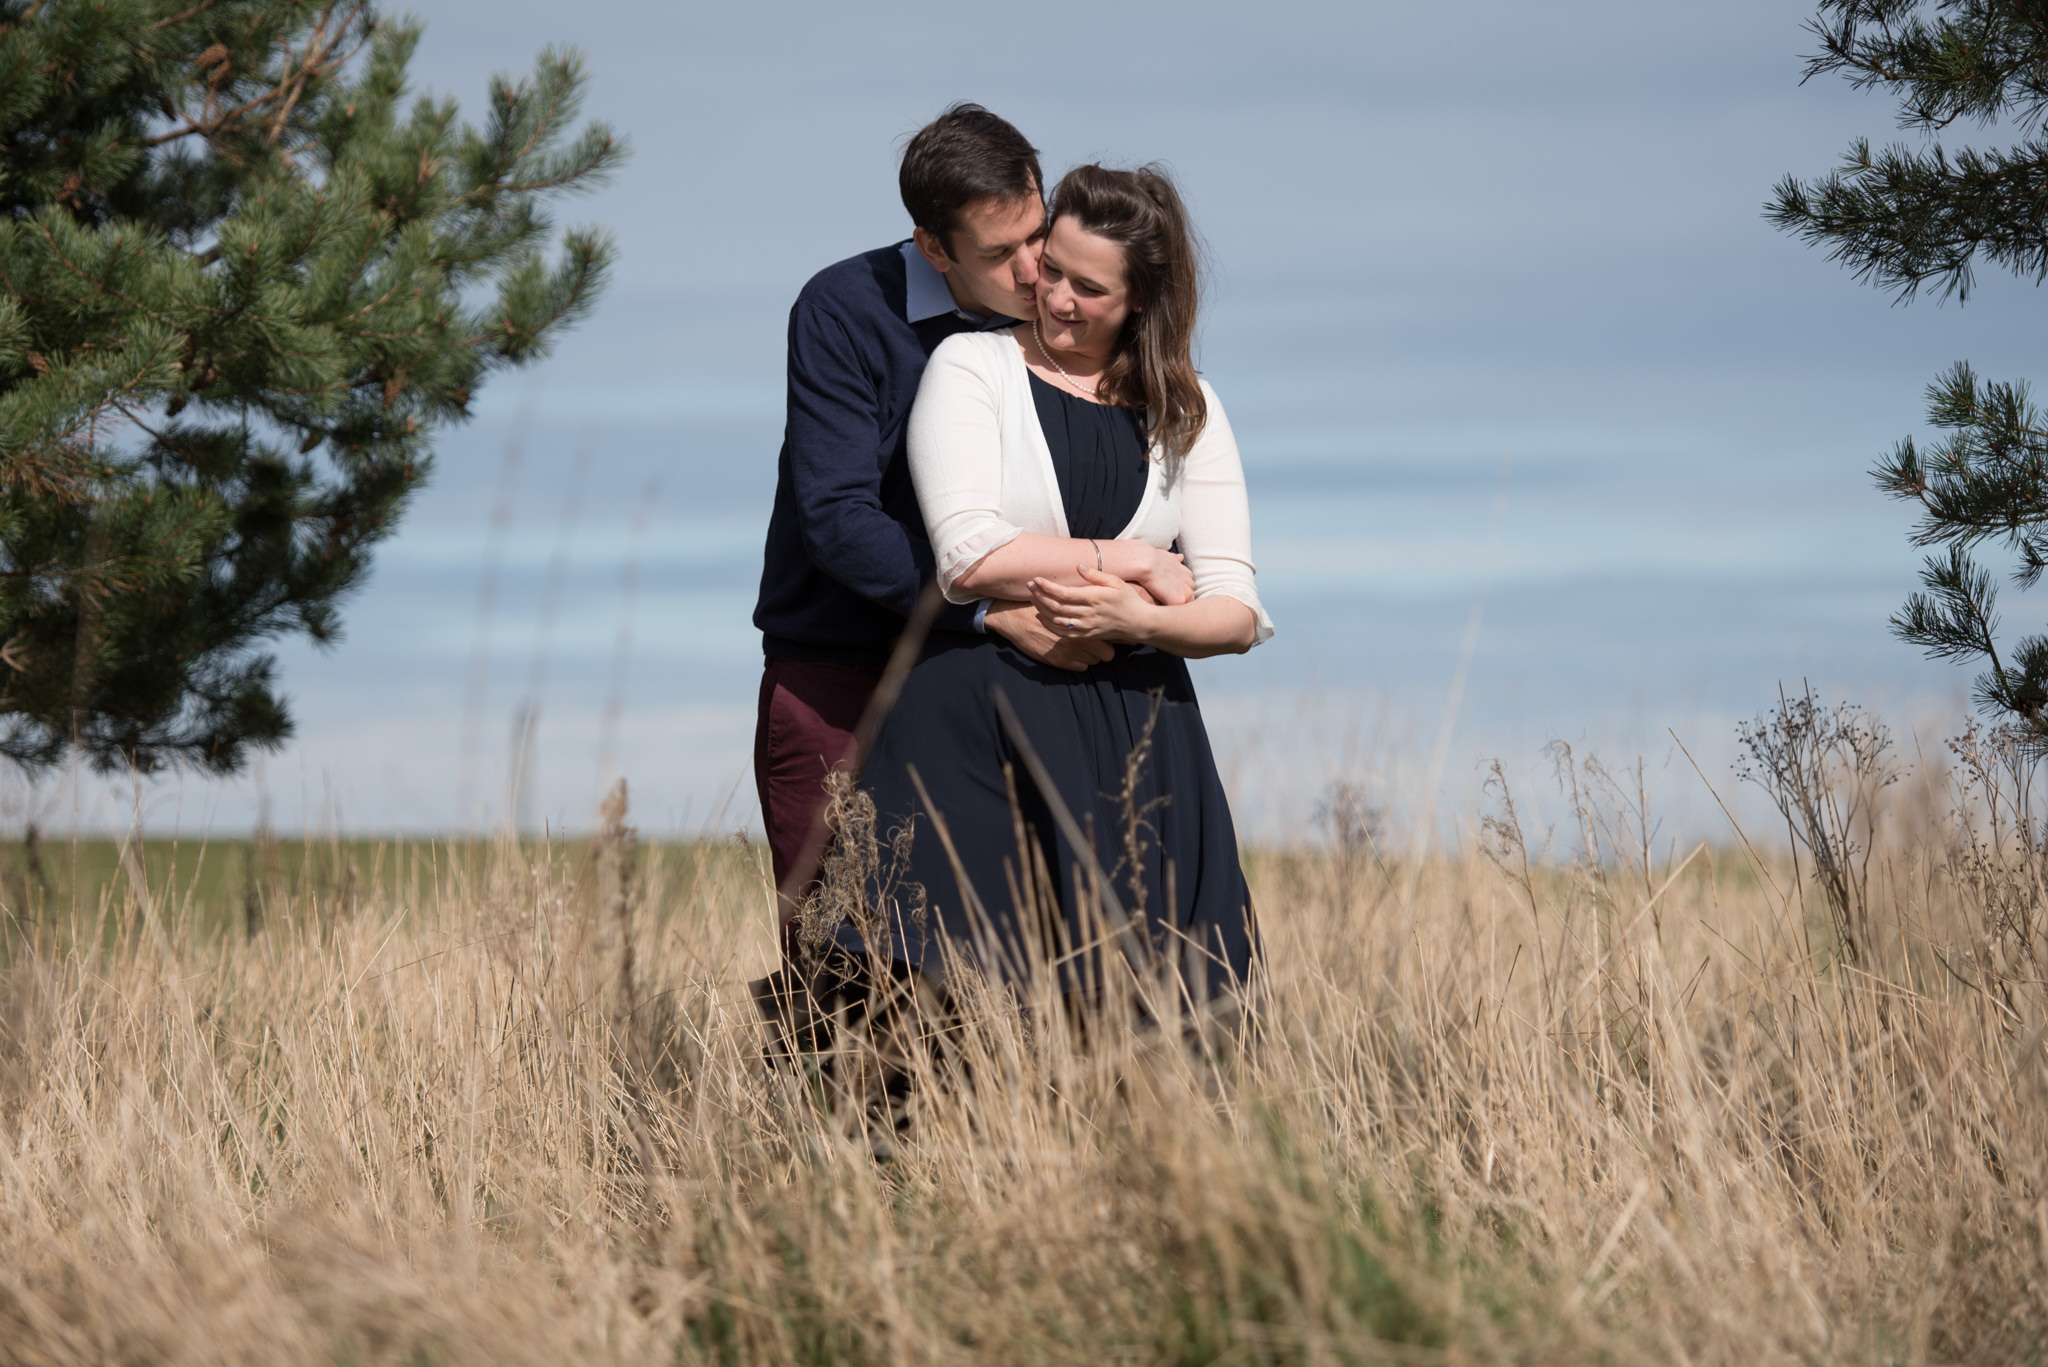 R&A - engagement shoot - © Julie Broadfoot - Photography by Juliebee - www.juliebee.co.uk